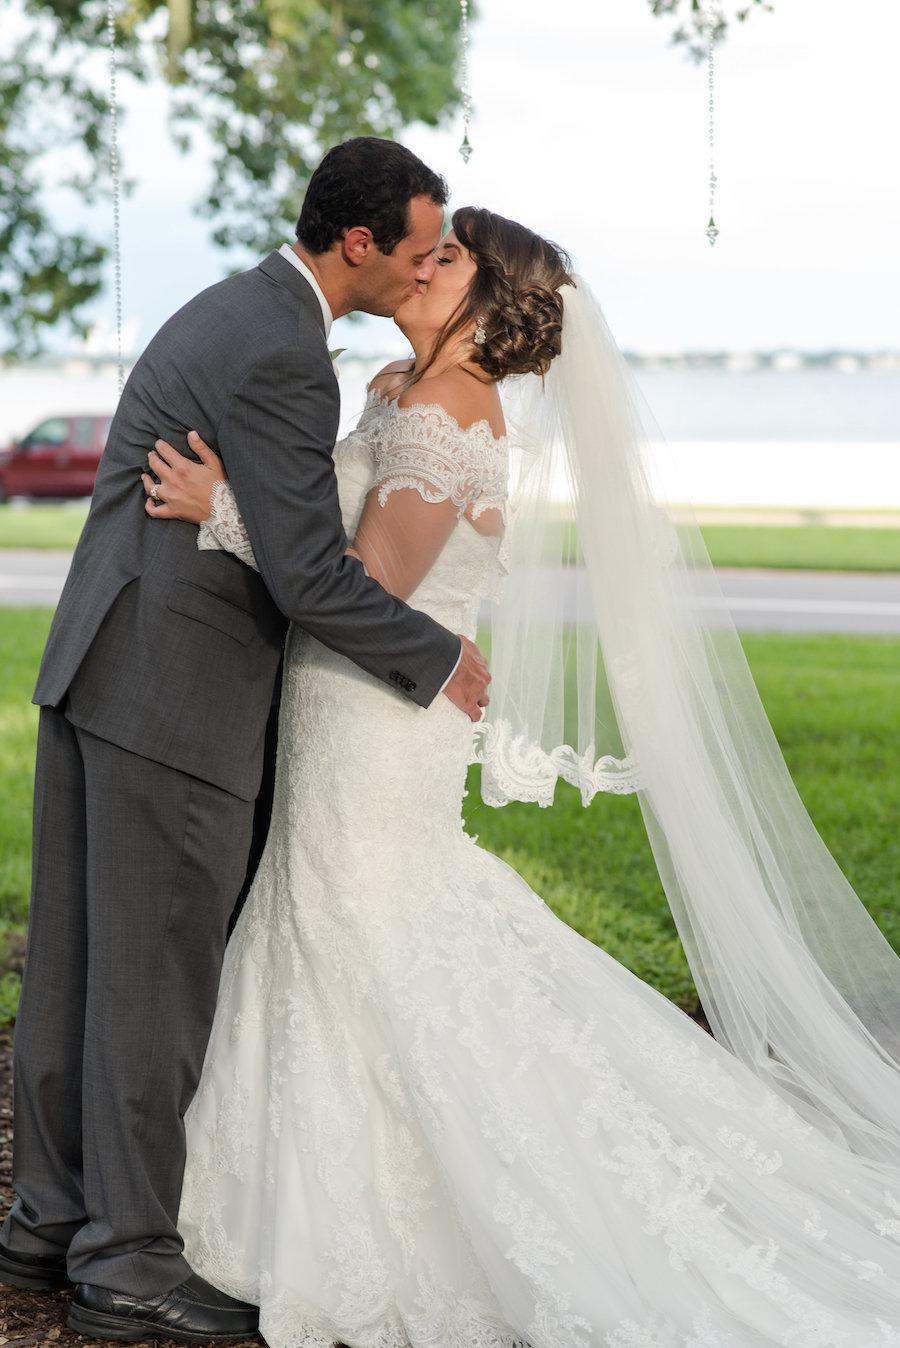 Outdoor Waterfront Garden Wedding Ceremony Portrait with Allure Wedding Dress   South Tampa Wedding Photographer Caroline & Evan Photography